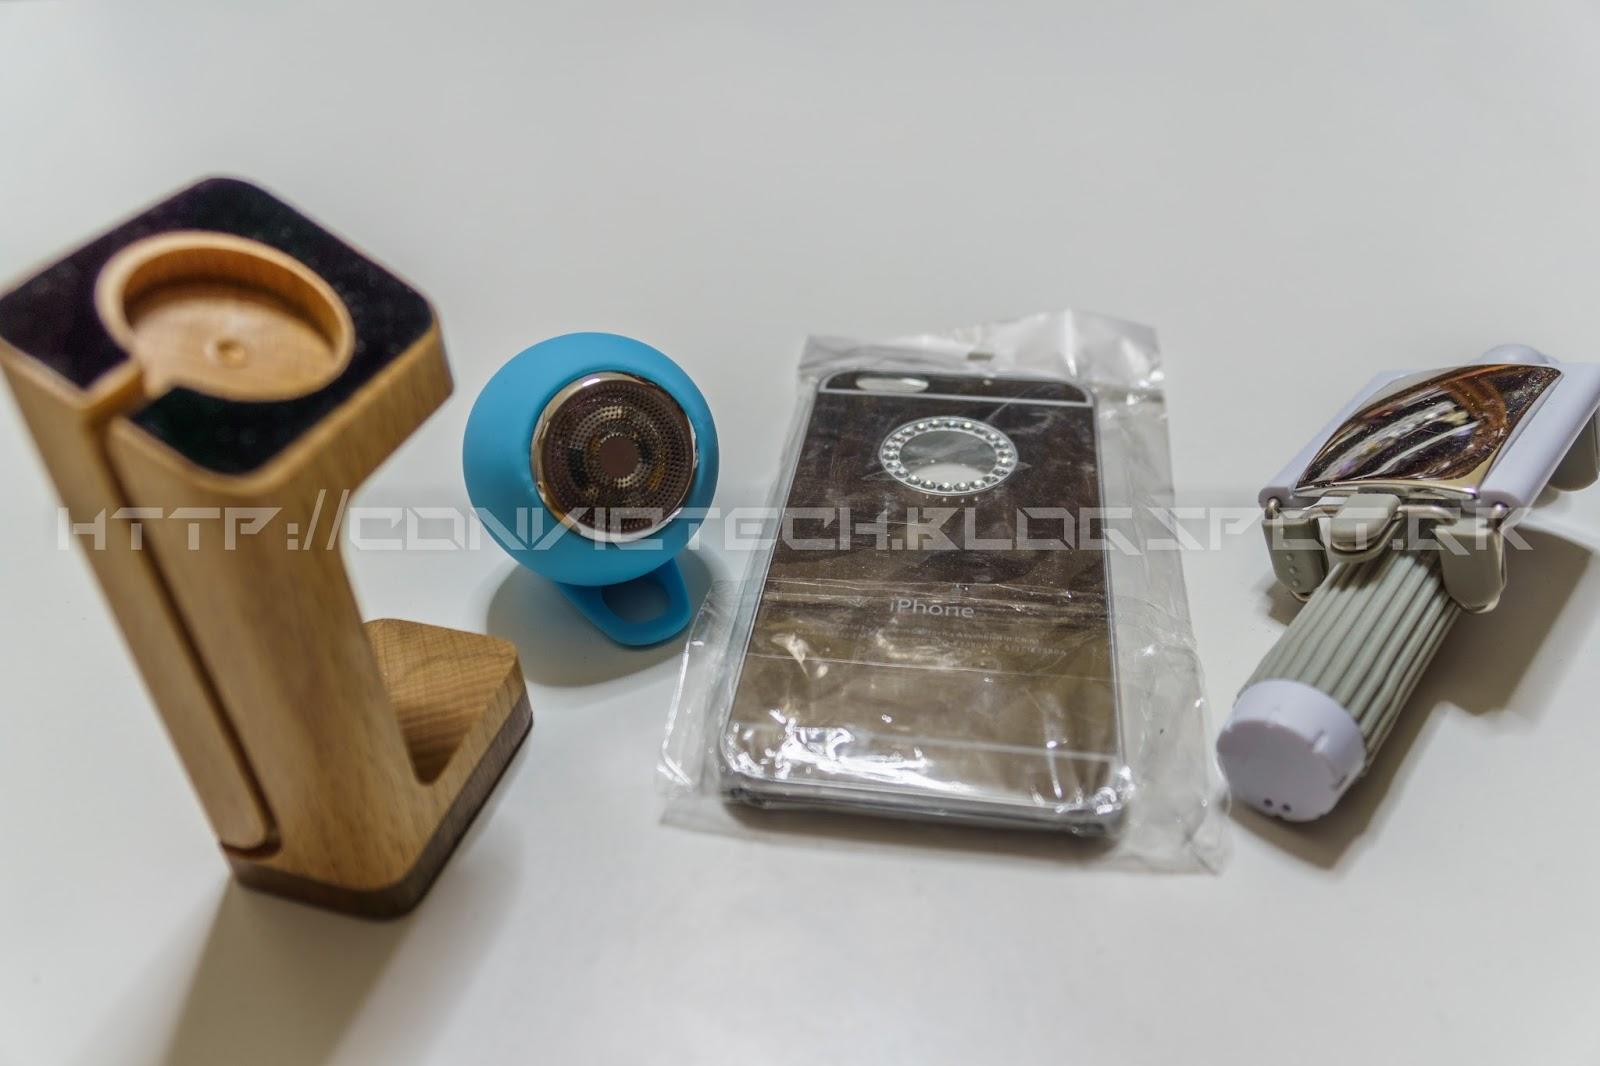 convictech mirror case for iphone 6 bluetooth waterproof portable speaker iphone 6 selfie. Black Bedroom Furniture Sets. Home Design Ideas